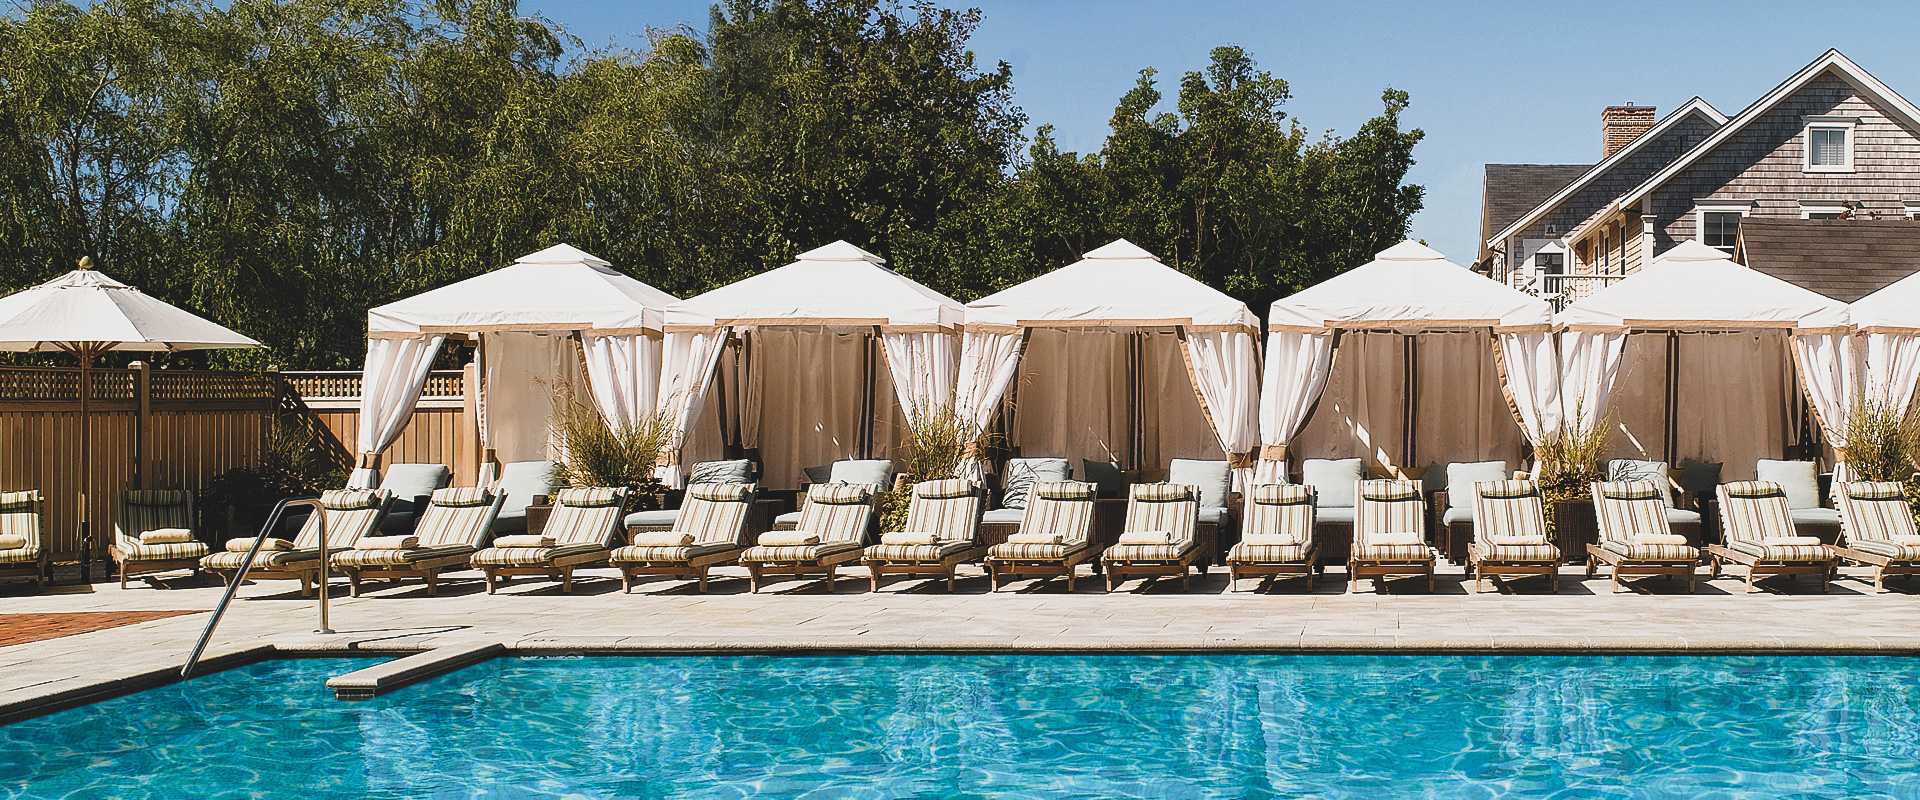 White Elephant Resorts   Landmark Nantucket and Palm Beach Hotels